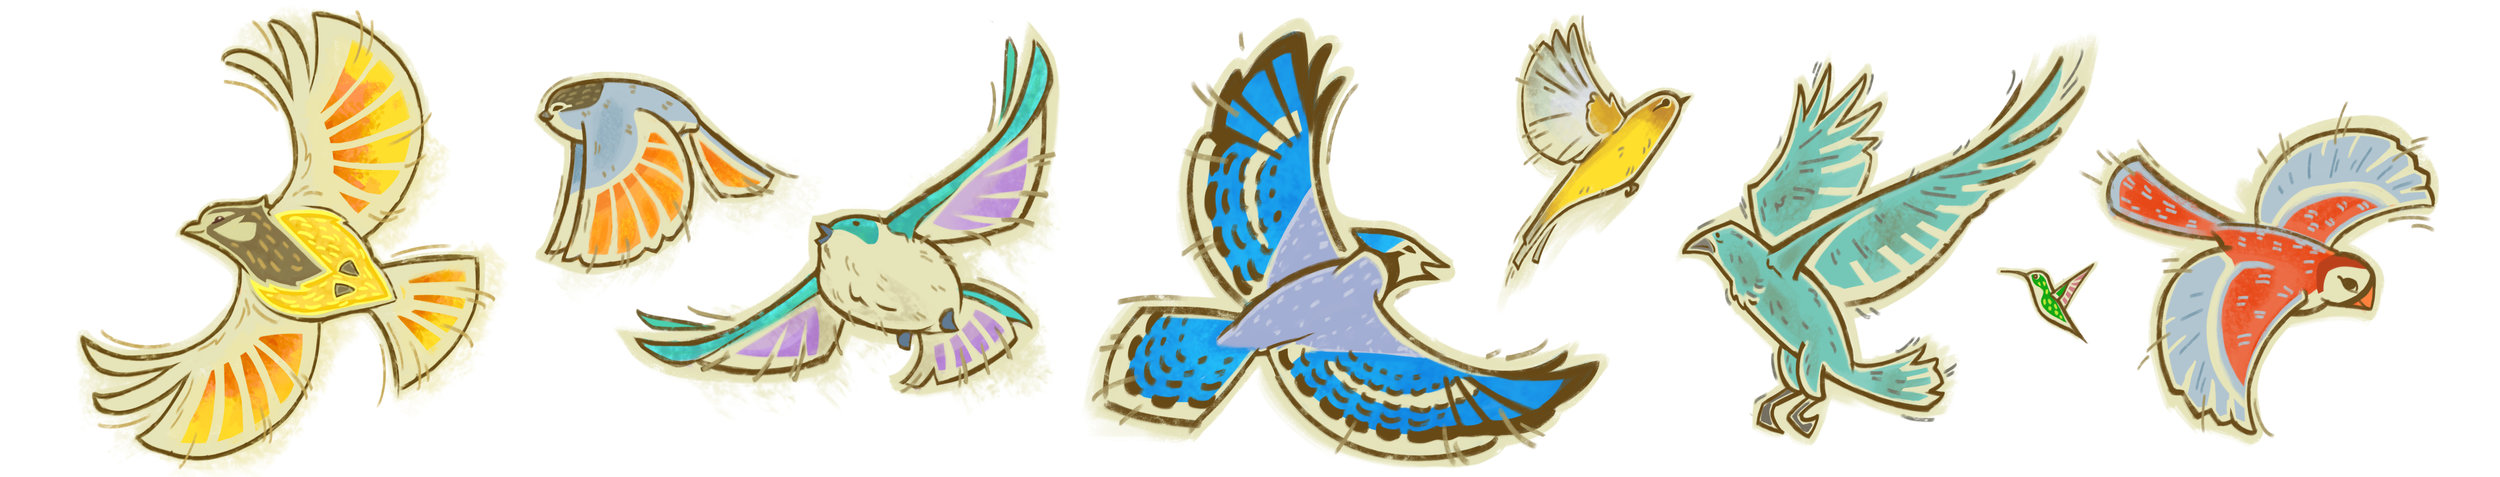 birds banner.jpg